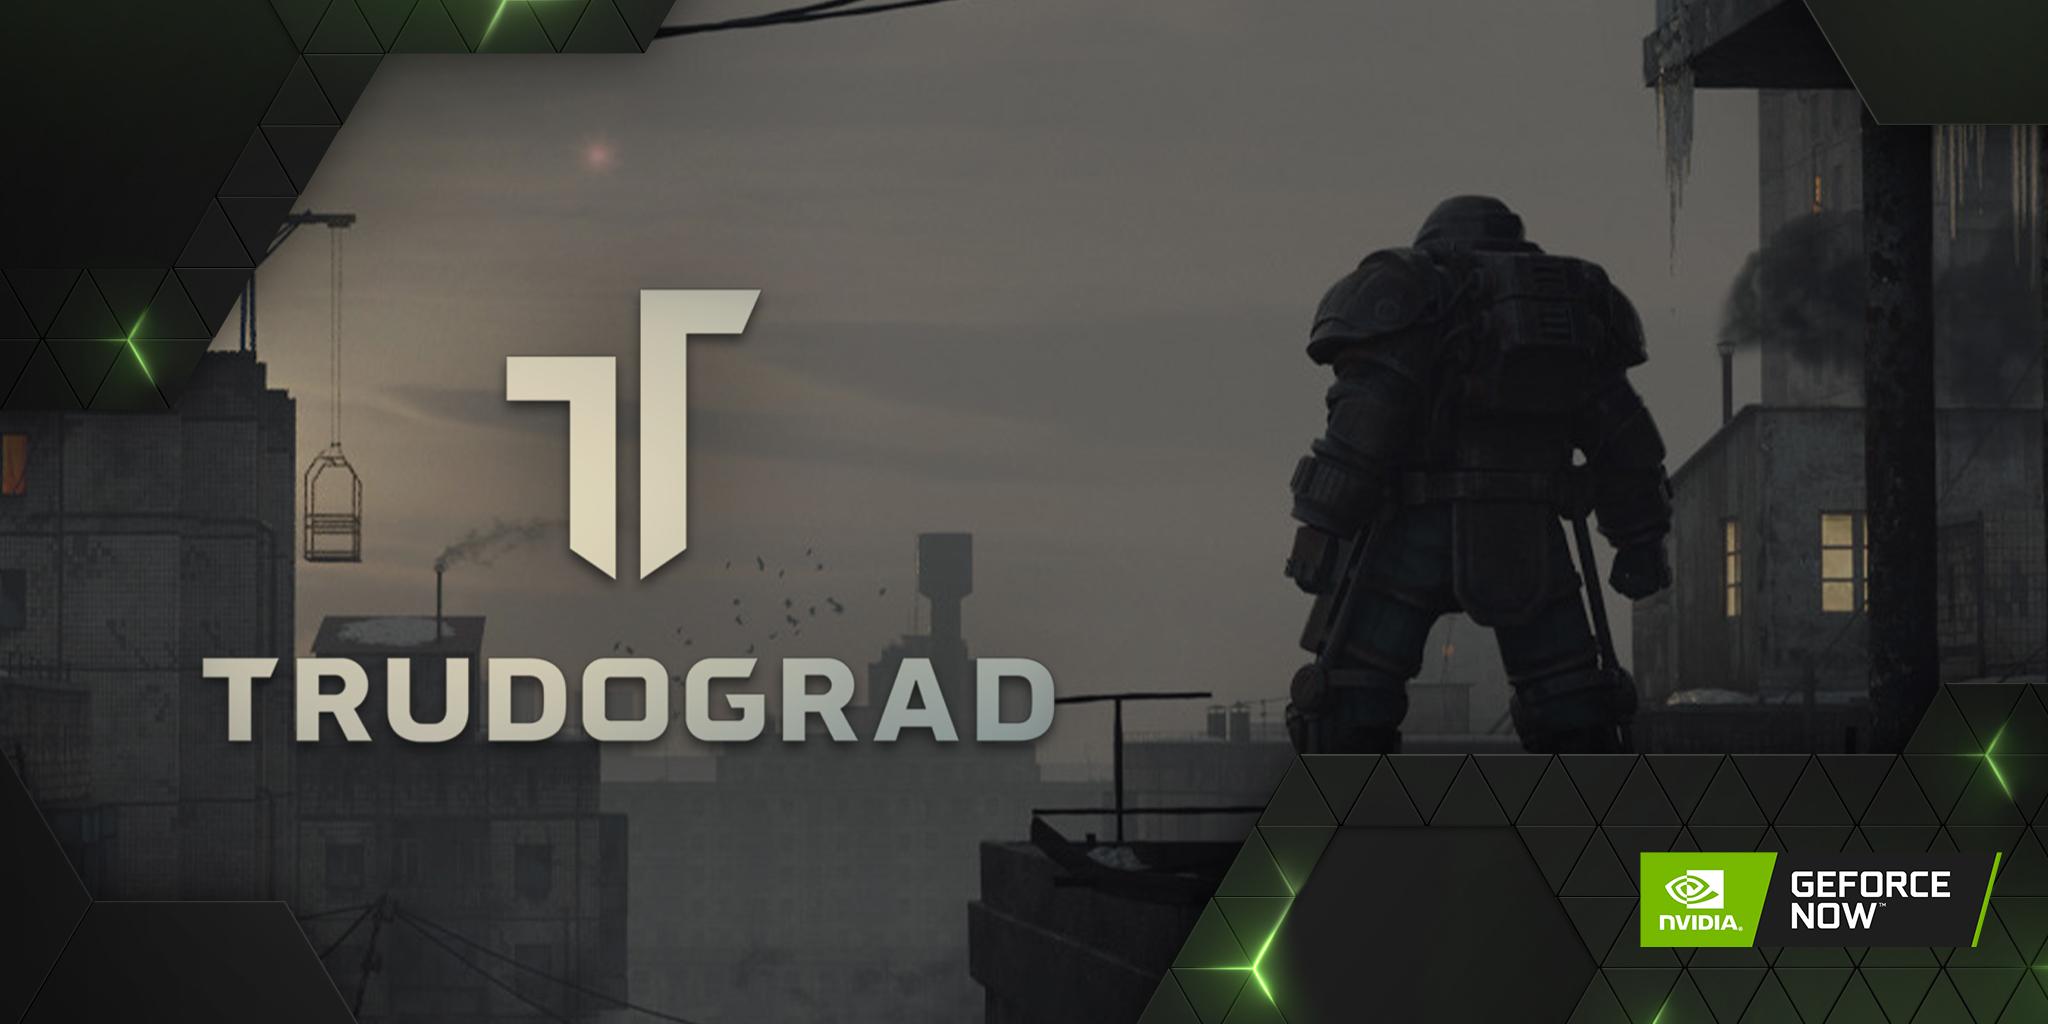 Trudograd GeForce Now